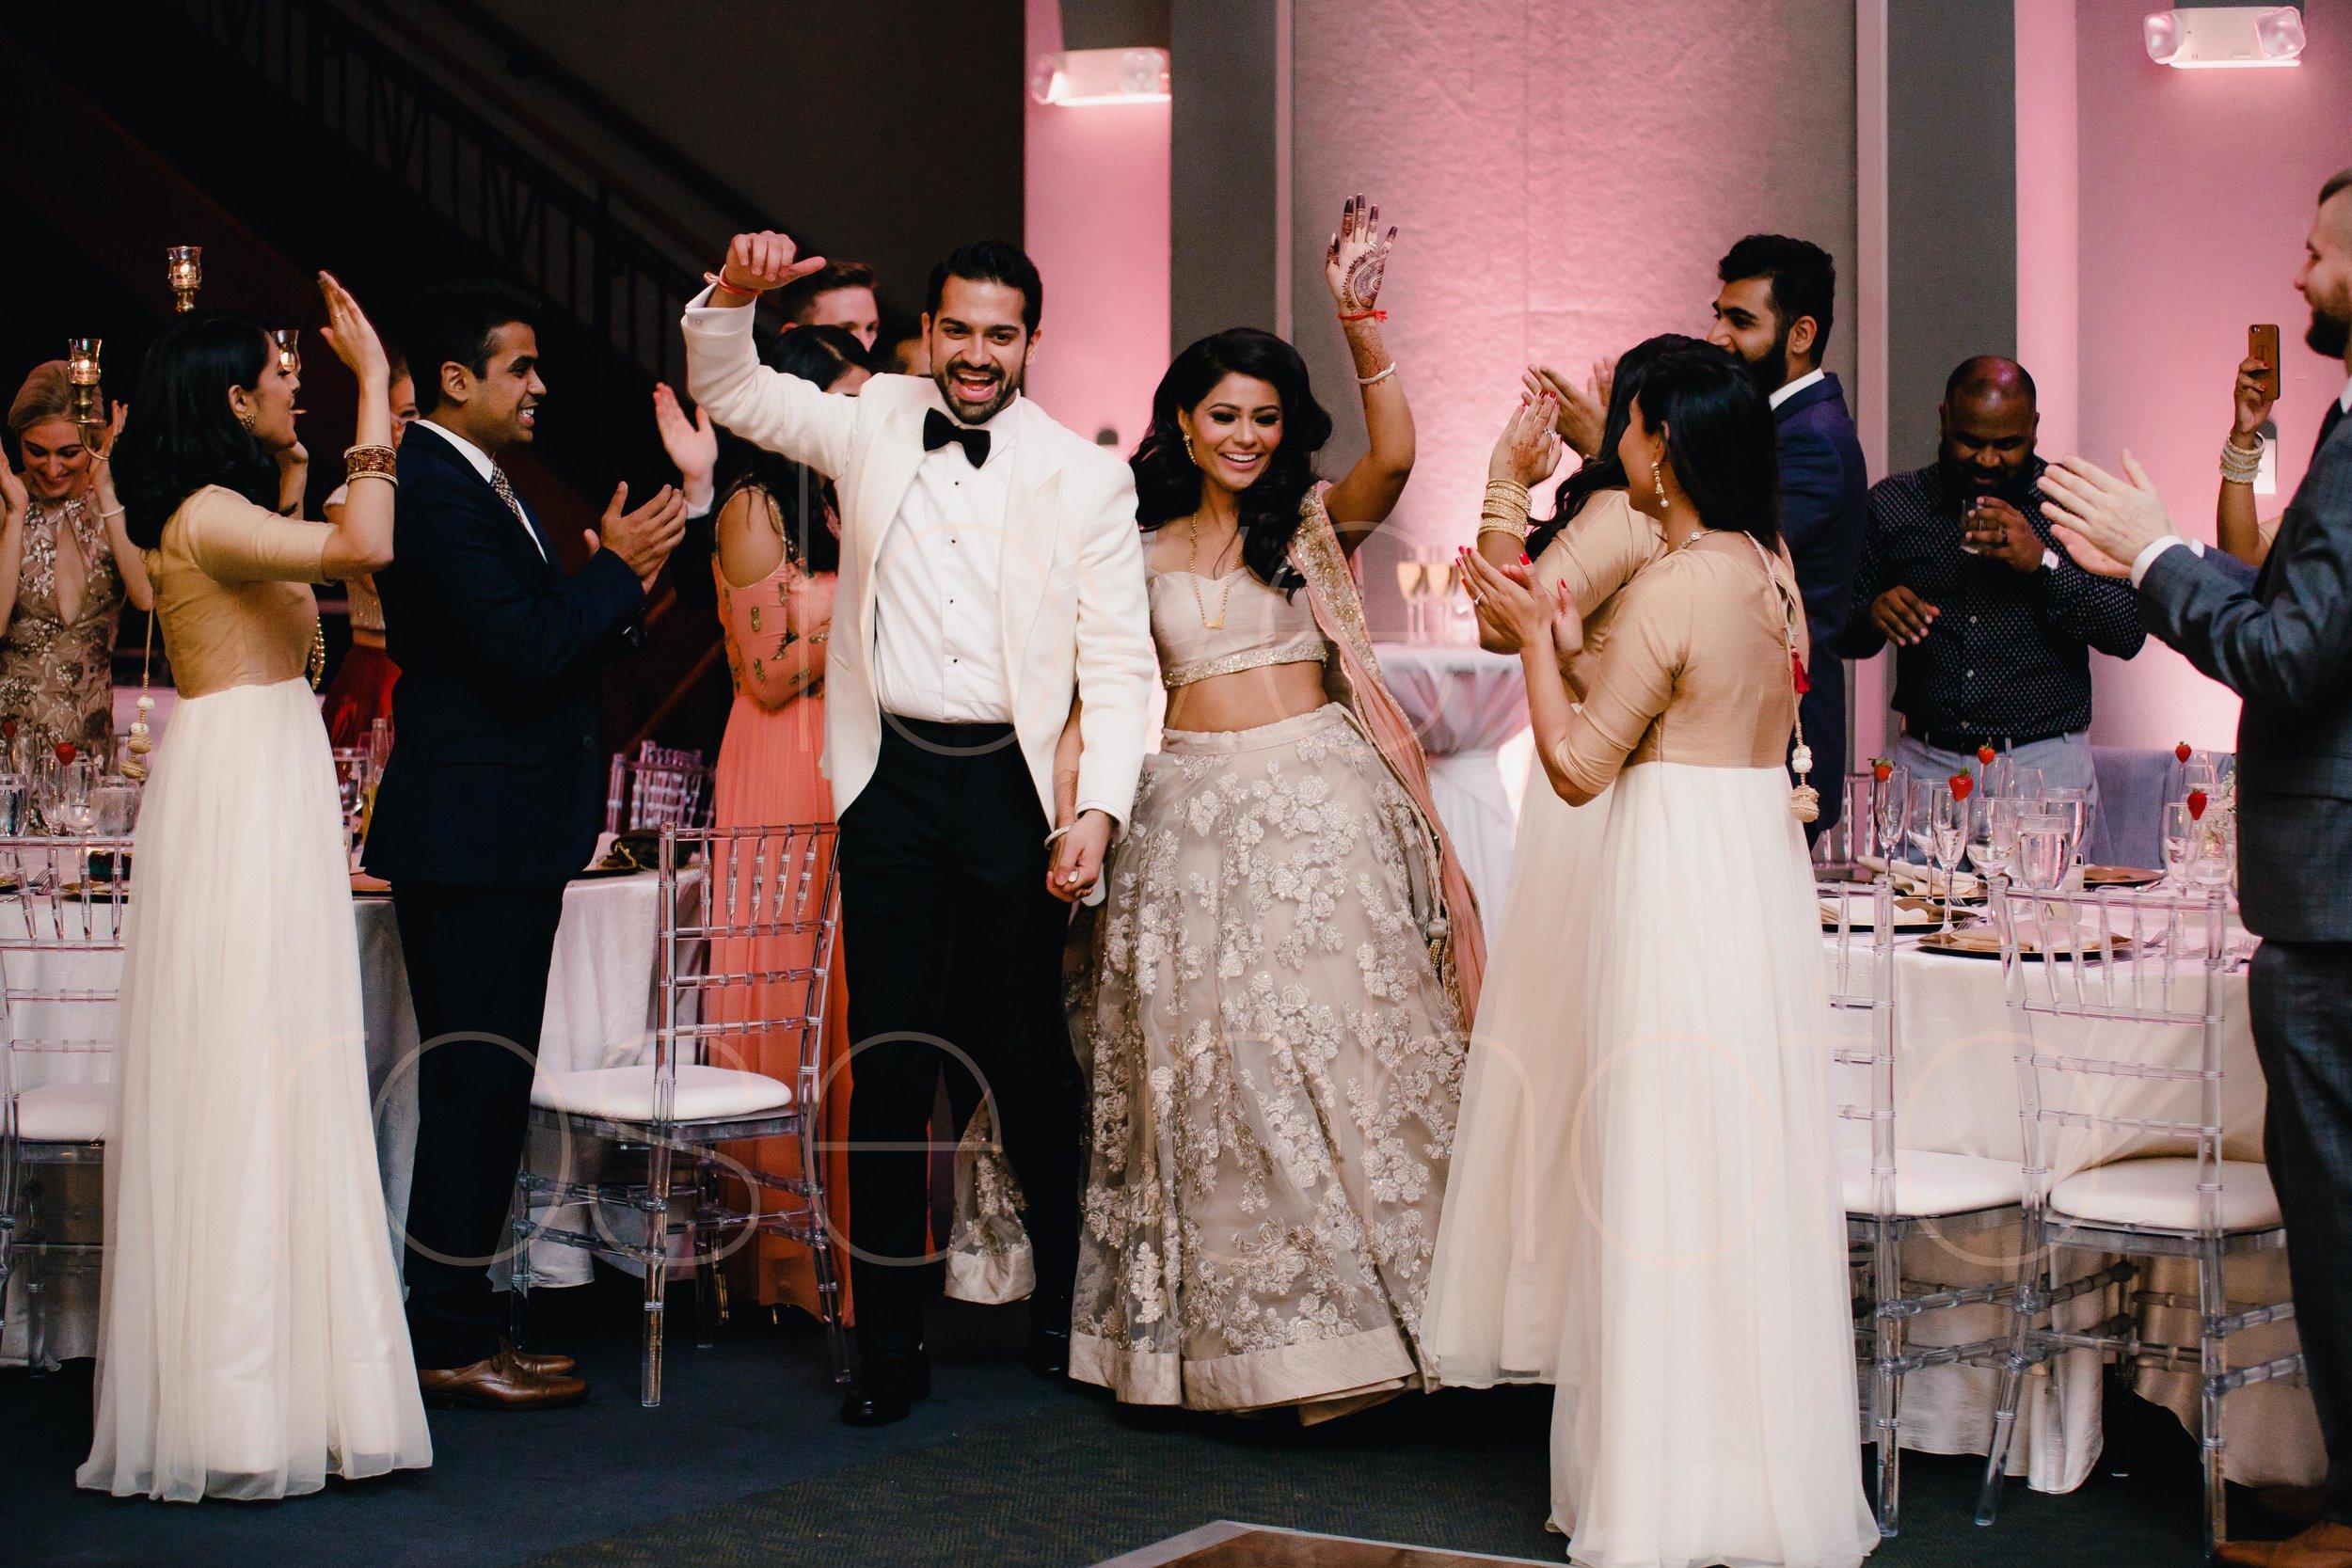 Chicago Indian Wedding best photography lifestyle wedding portrait luxury wedding-52.jpg